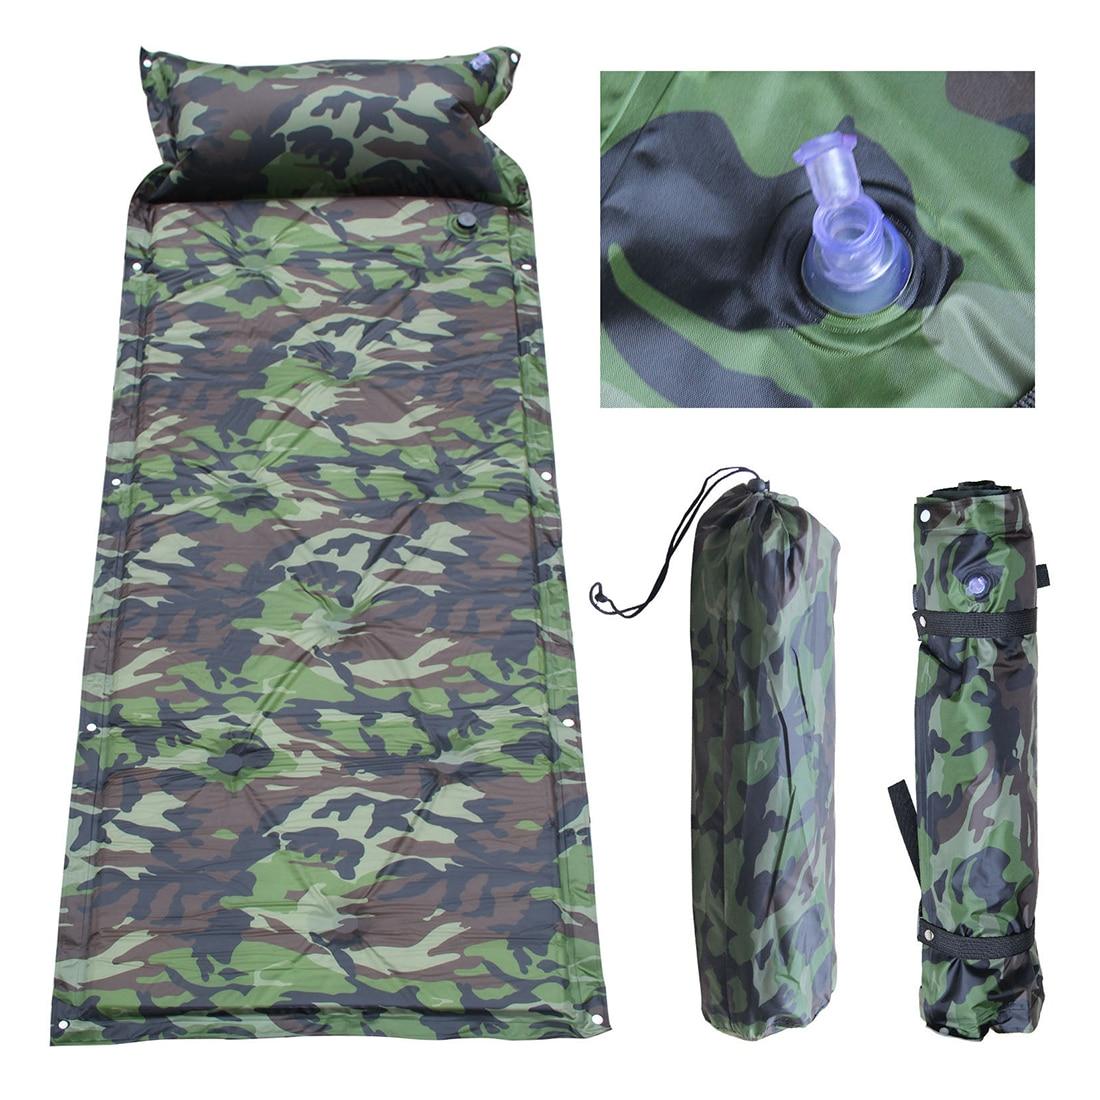 Self Inflating Camping Roll Mat/Pad Sleeping Bed Inflatable Pillow Mattress +Bag